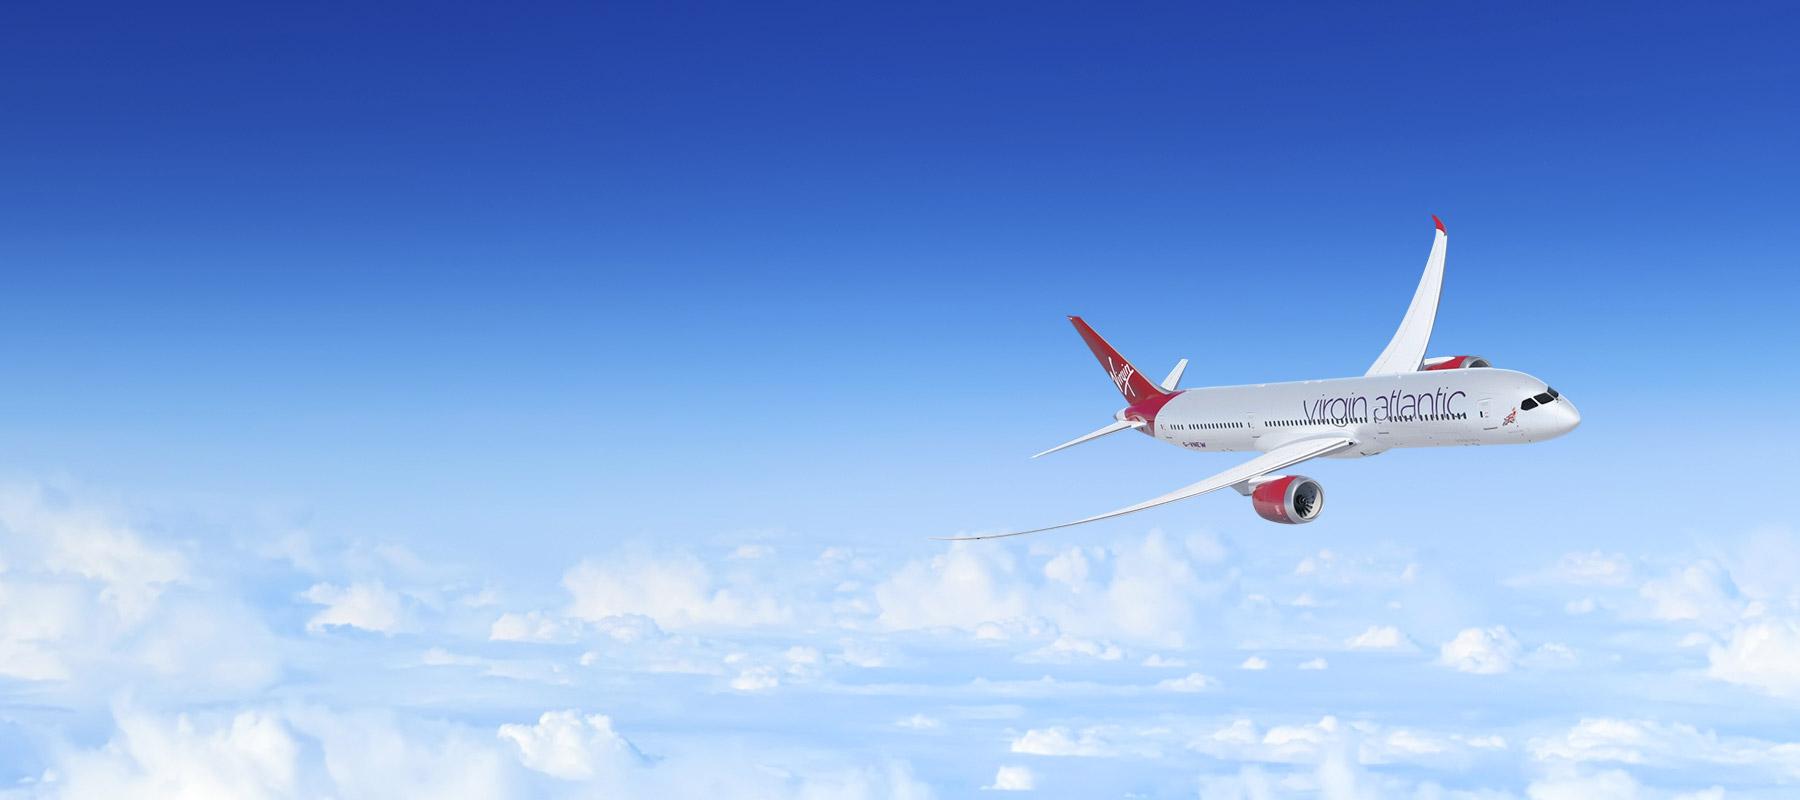 Virgin Atlantic Airlines Vs Flight Deals Book Tickets